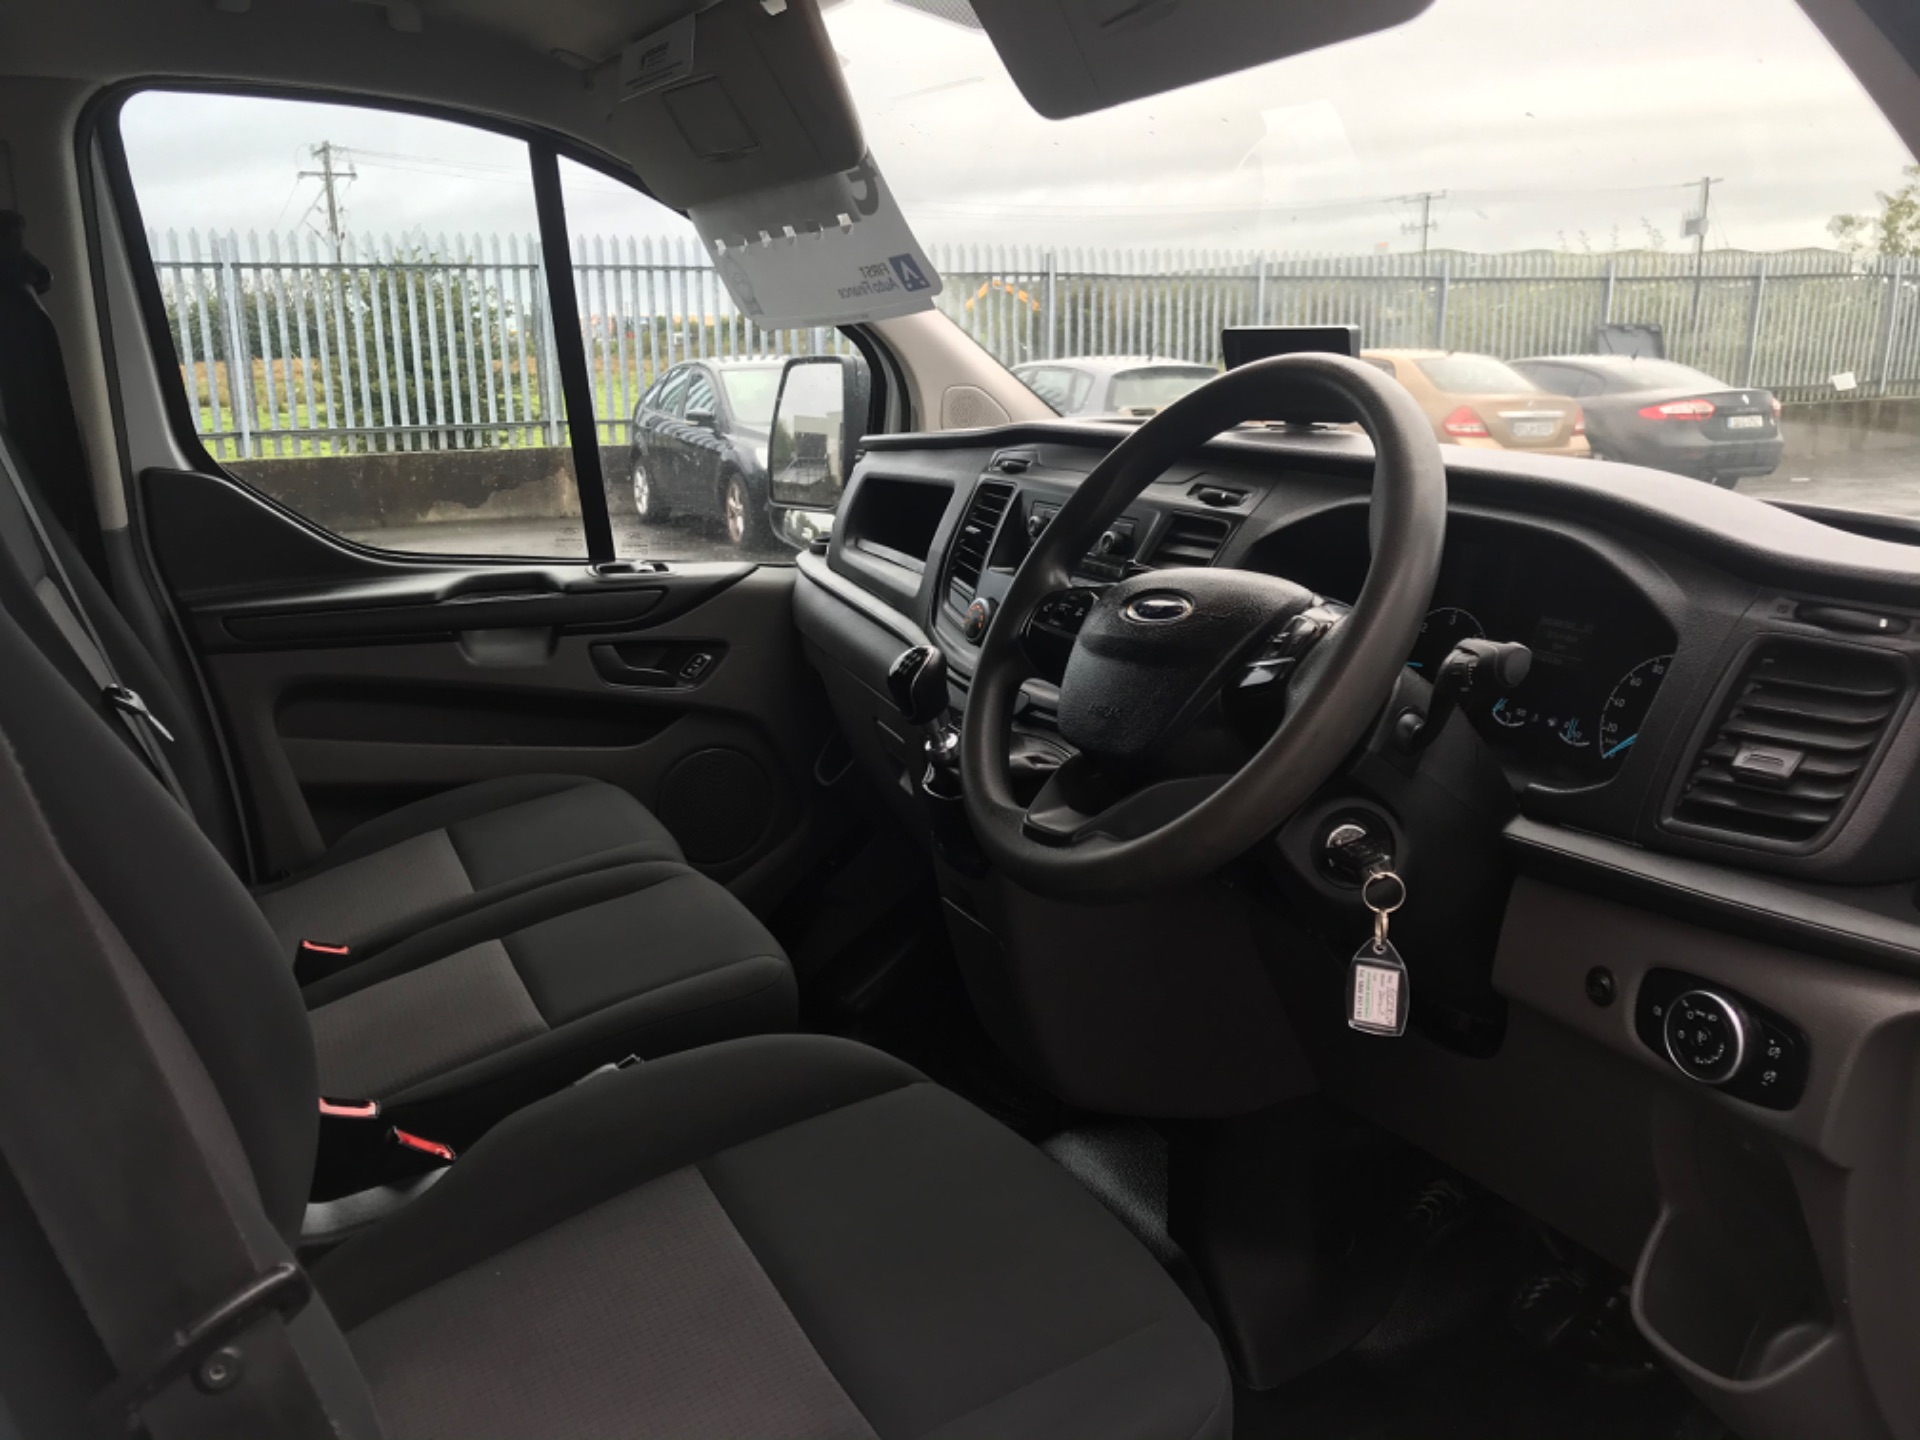 2018 Ford Transit Custom Custom 300 Lbase 2.0 105PS 3DR (181D27029) Image 13